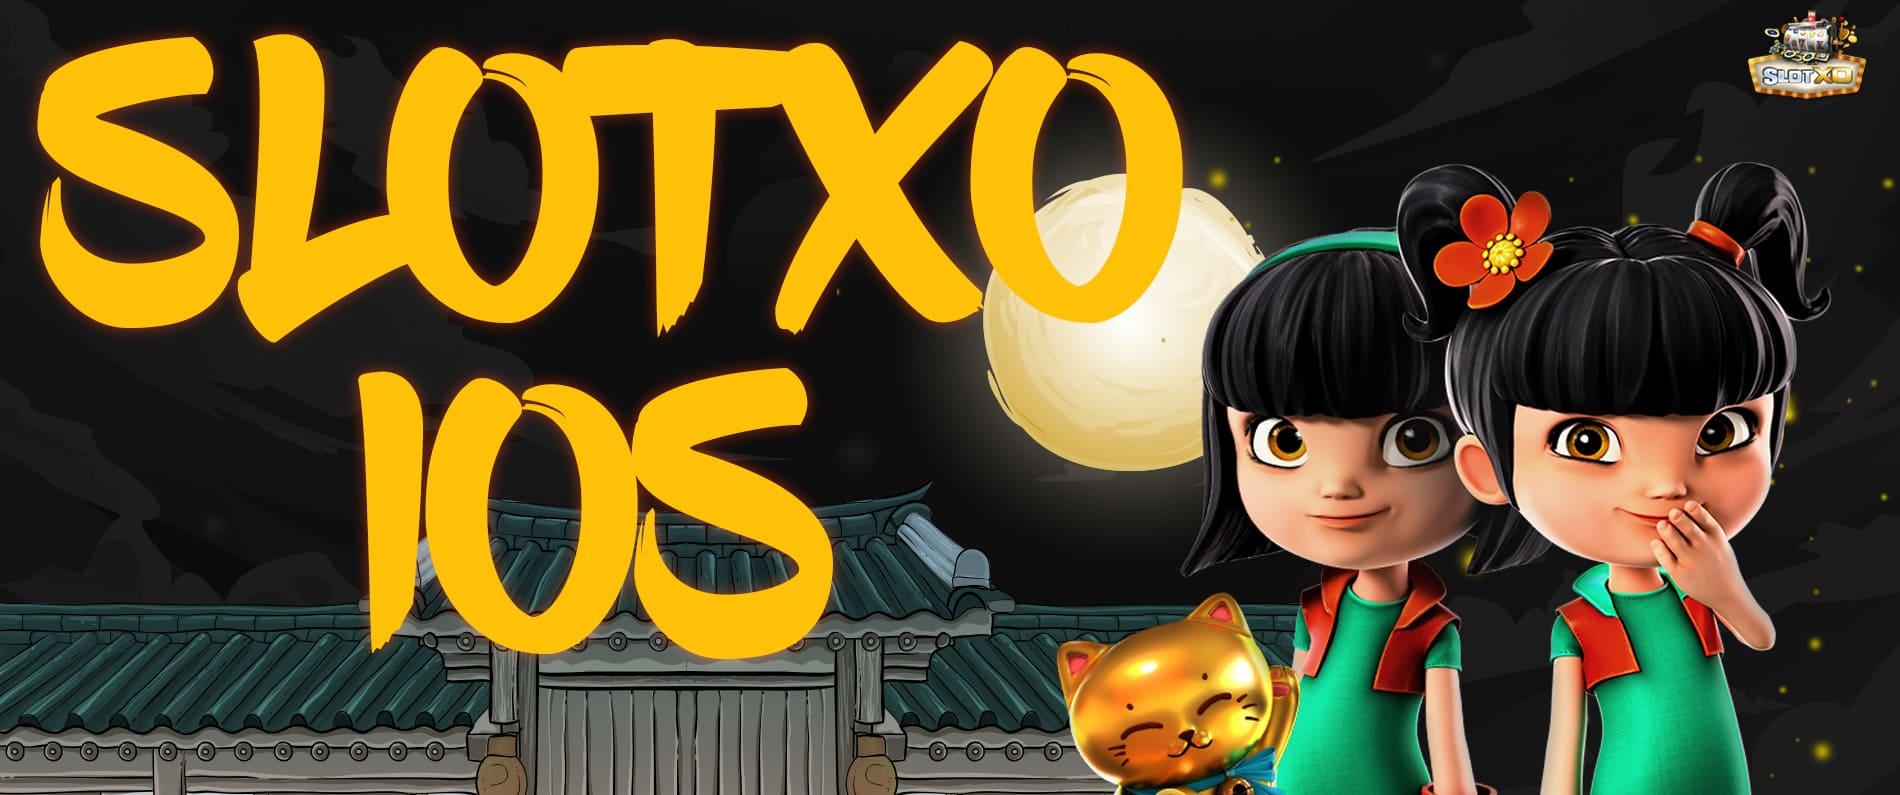 slotxo ios download slotxo ดาวน์โหลดslotxo